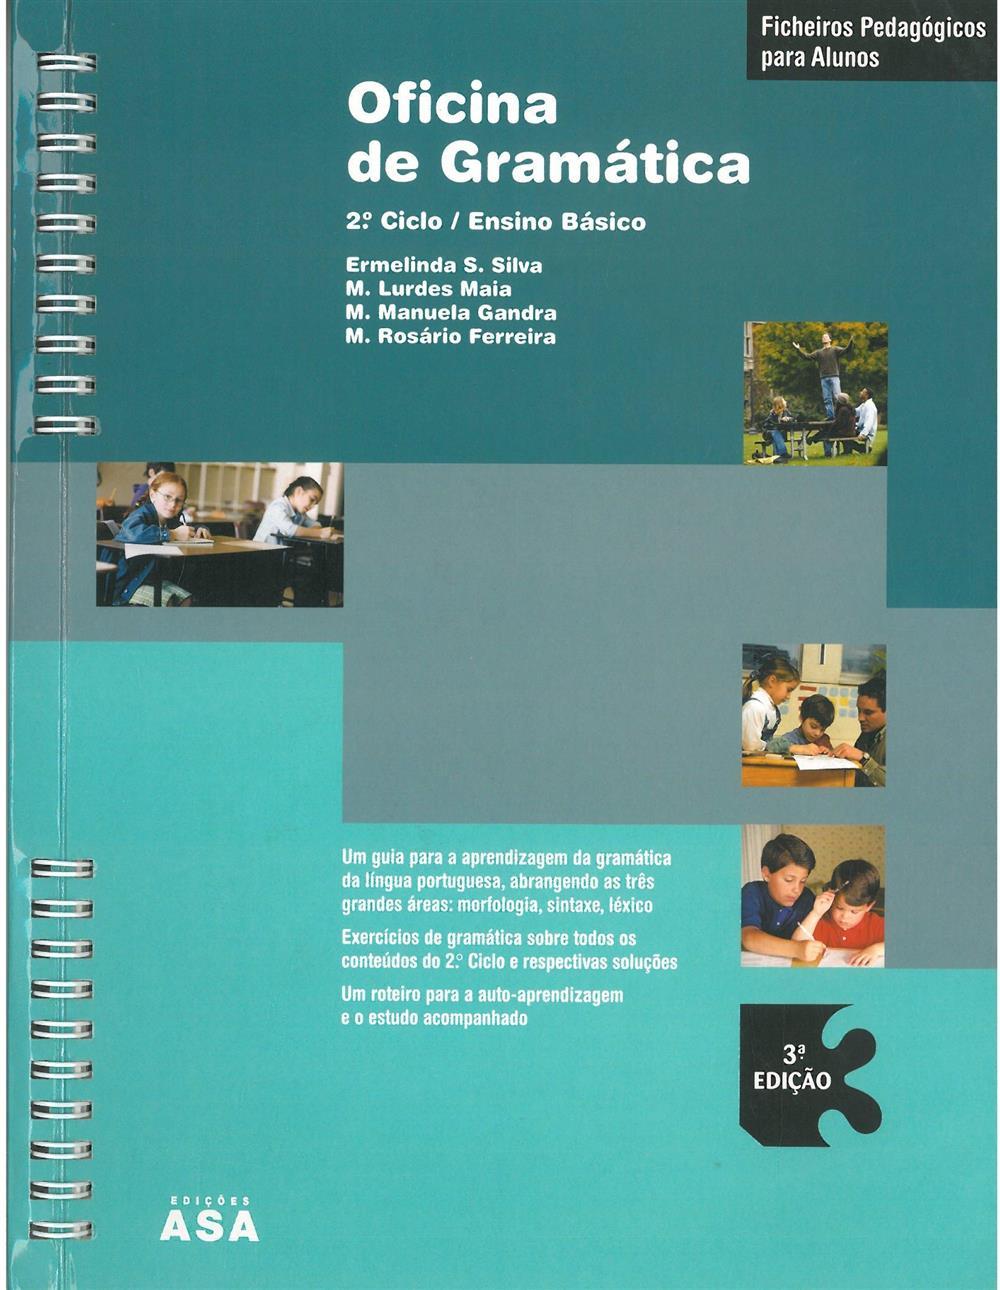 Oficina de gramática.jpg